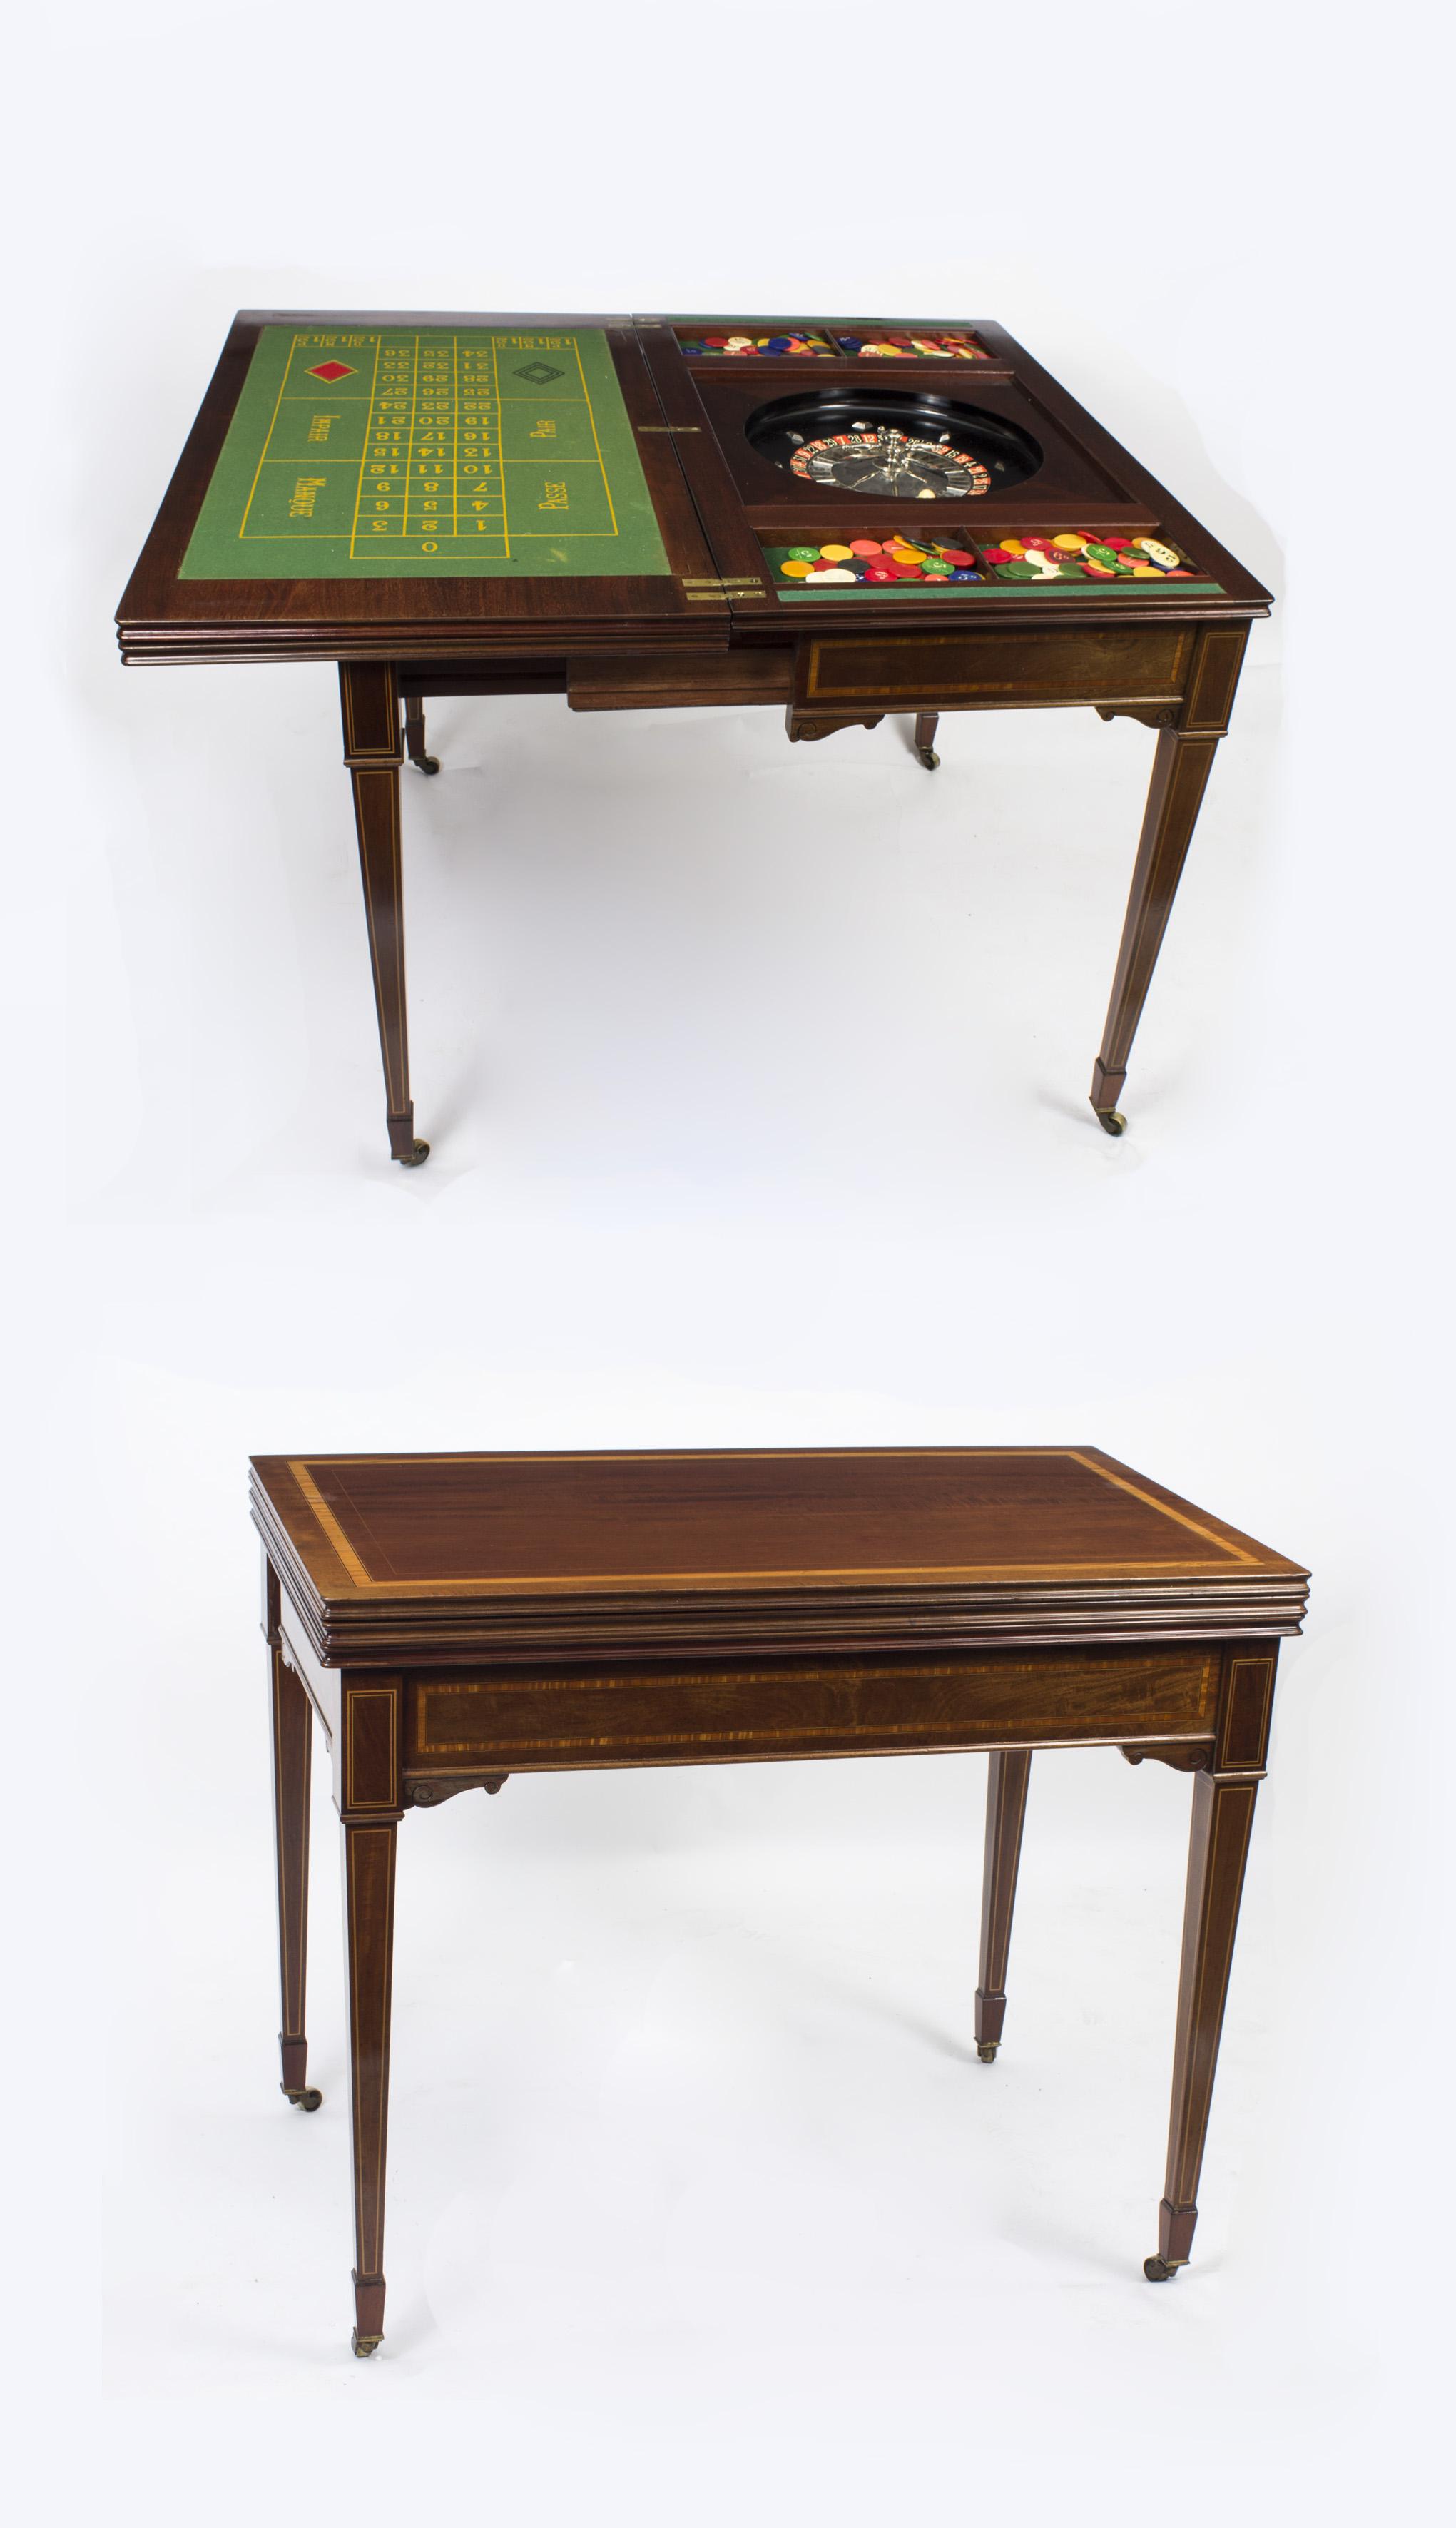 Antique Edwardian Mahogany Games Roulette Table c 1900